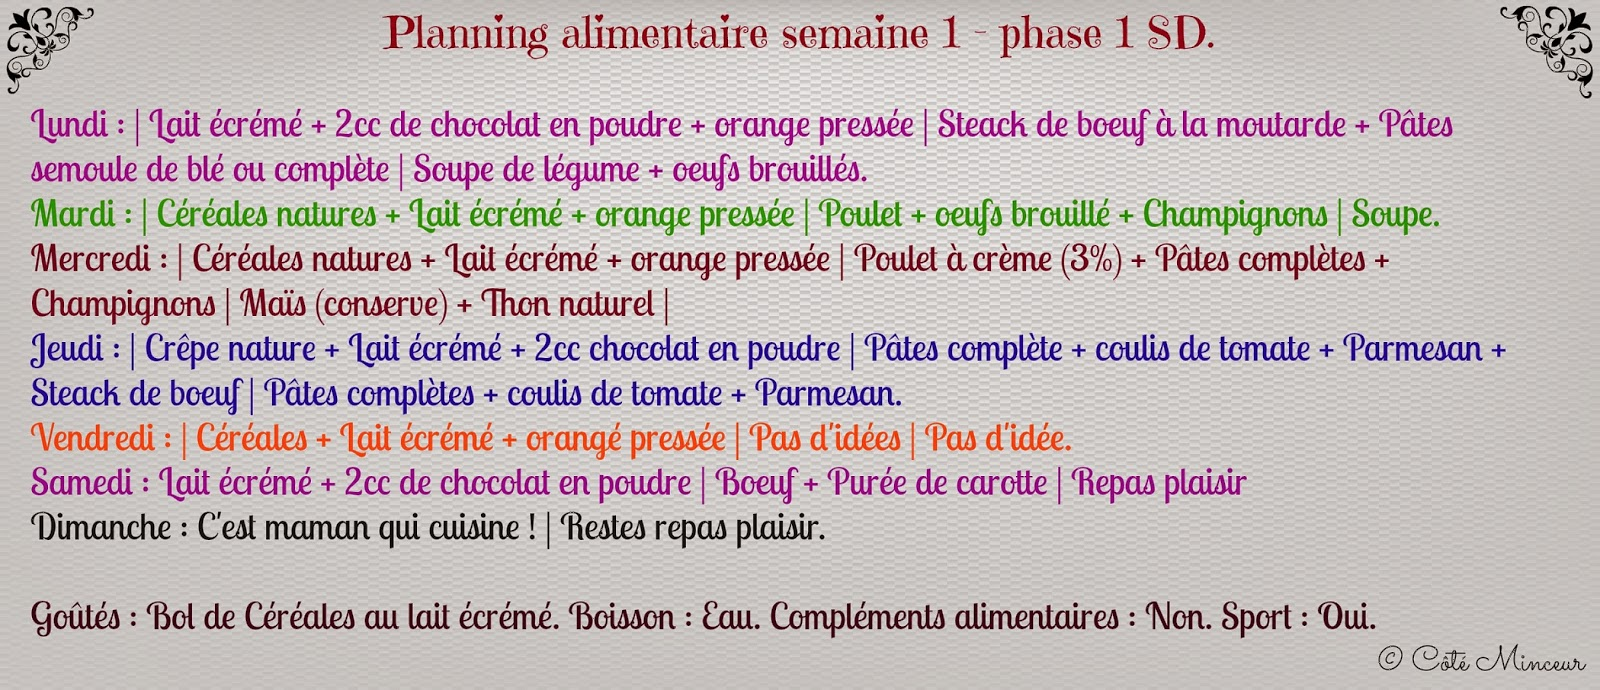 Hervorragend Côté Minceur : Planning alimentaire - Semaine 1 { Phase 1 } CA41